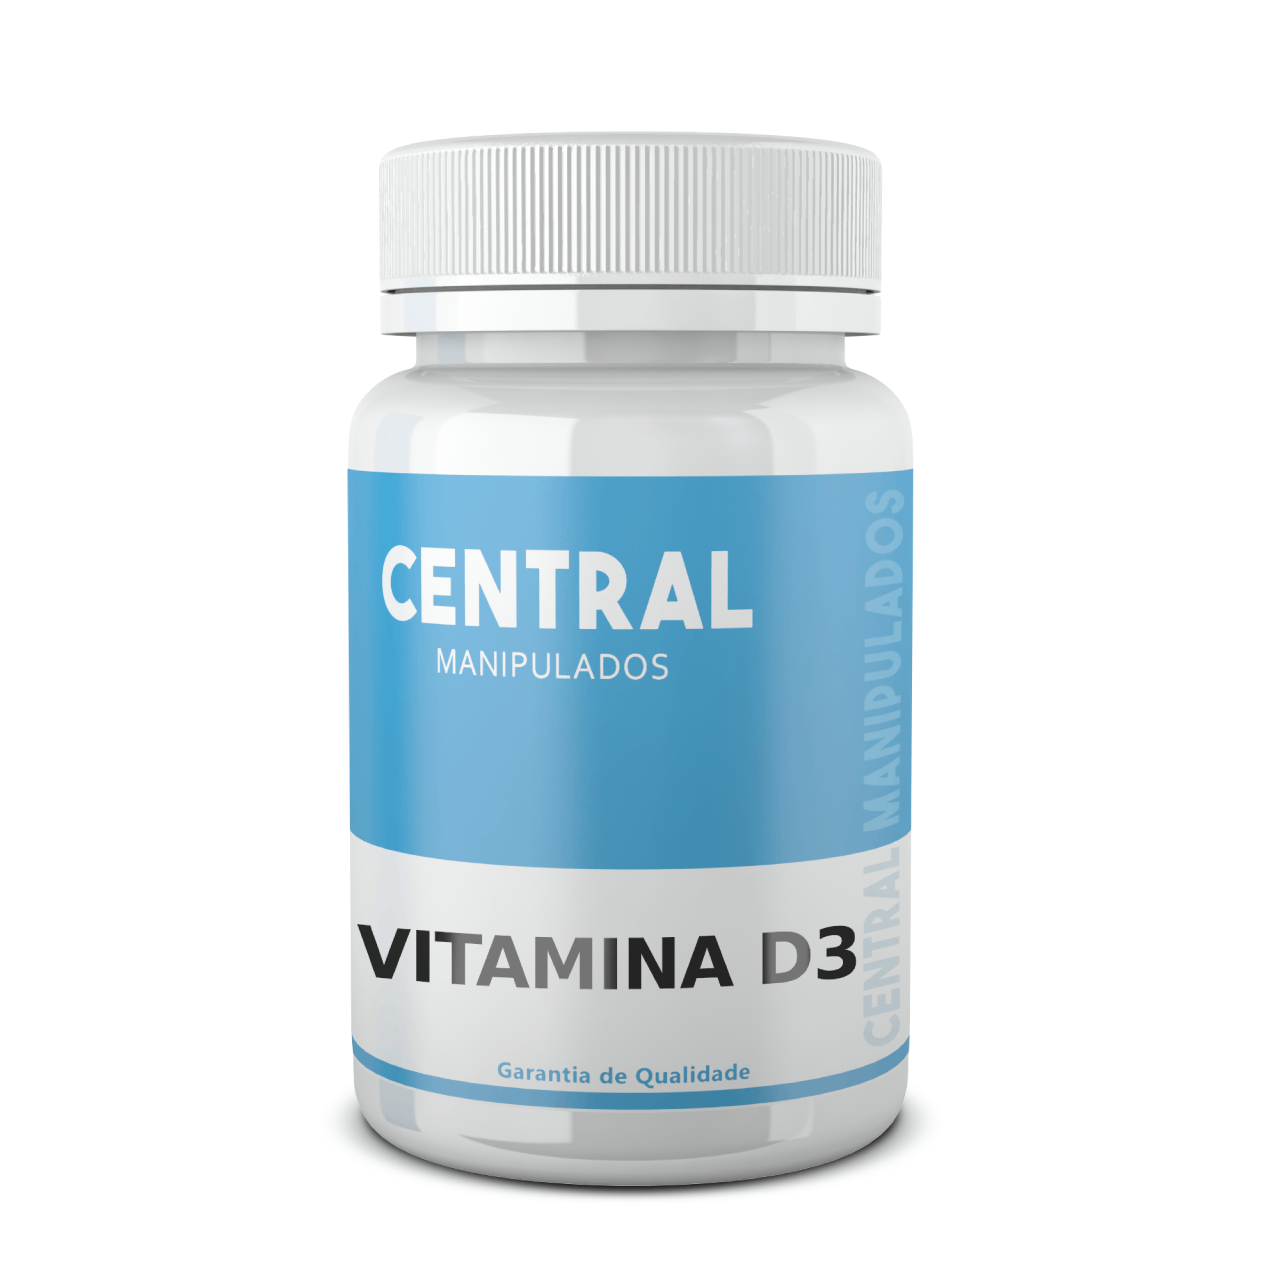 Vitamina D3 2.000 UI - 60 cápsulas - Saúde Óssea e Muscular